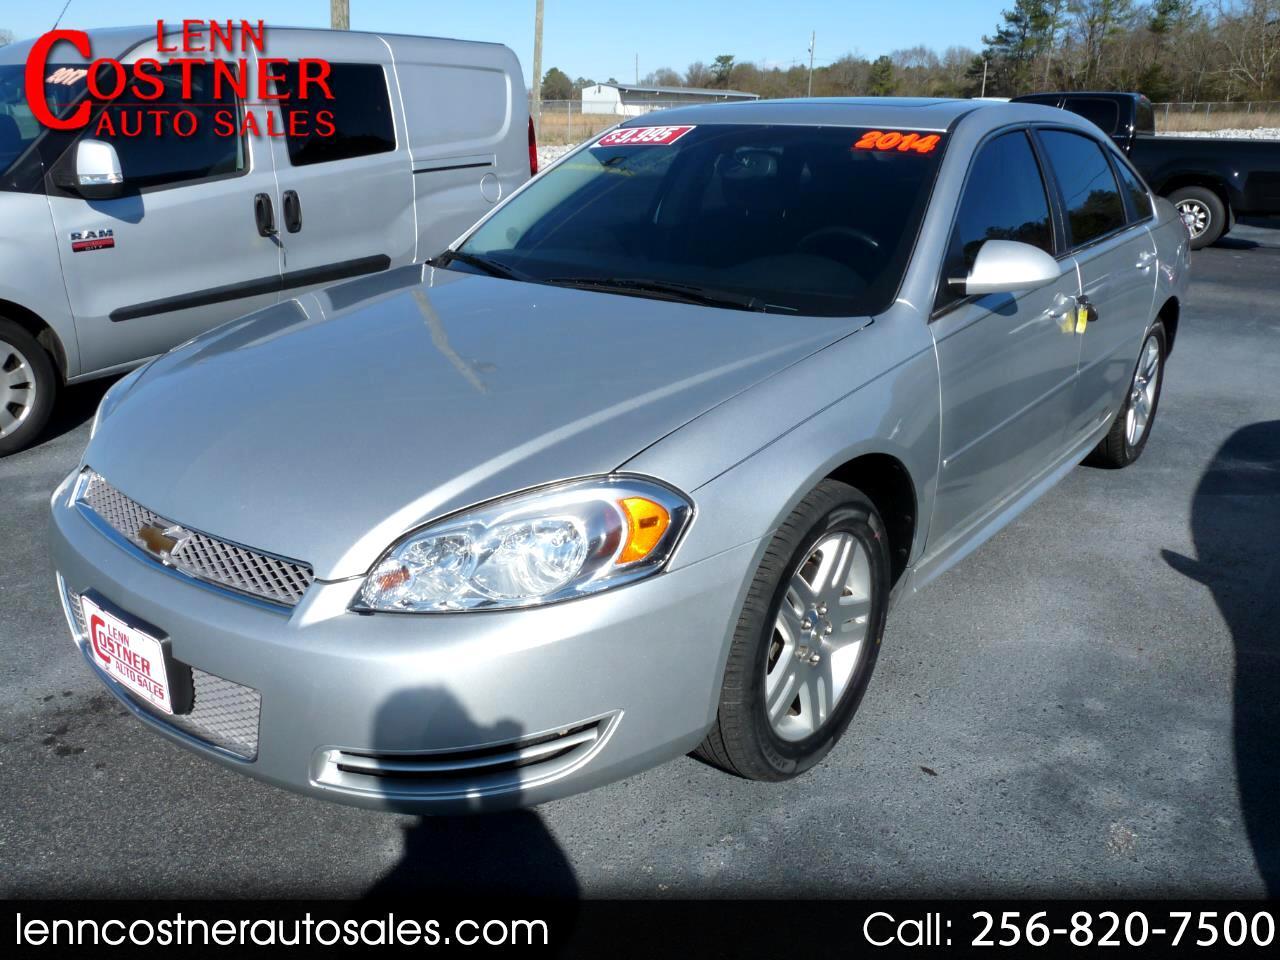 Chevrolet Impala Limited 4dr Sdn LT Fleet 2014